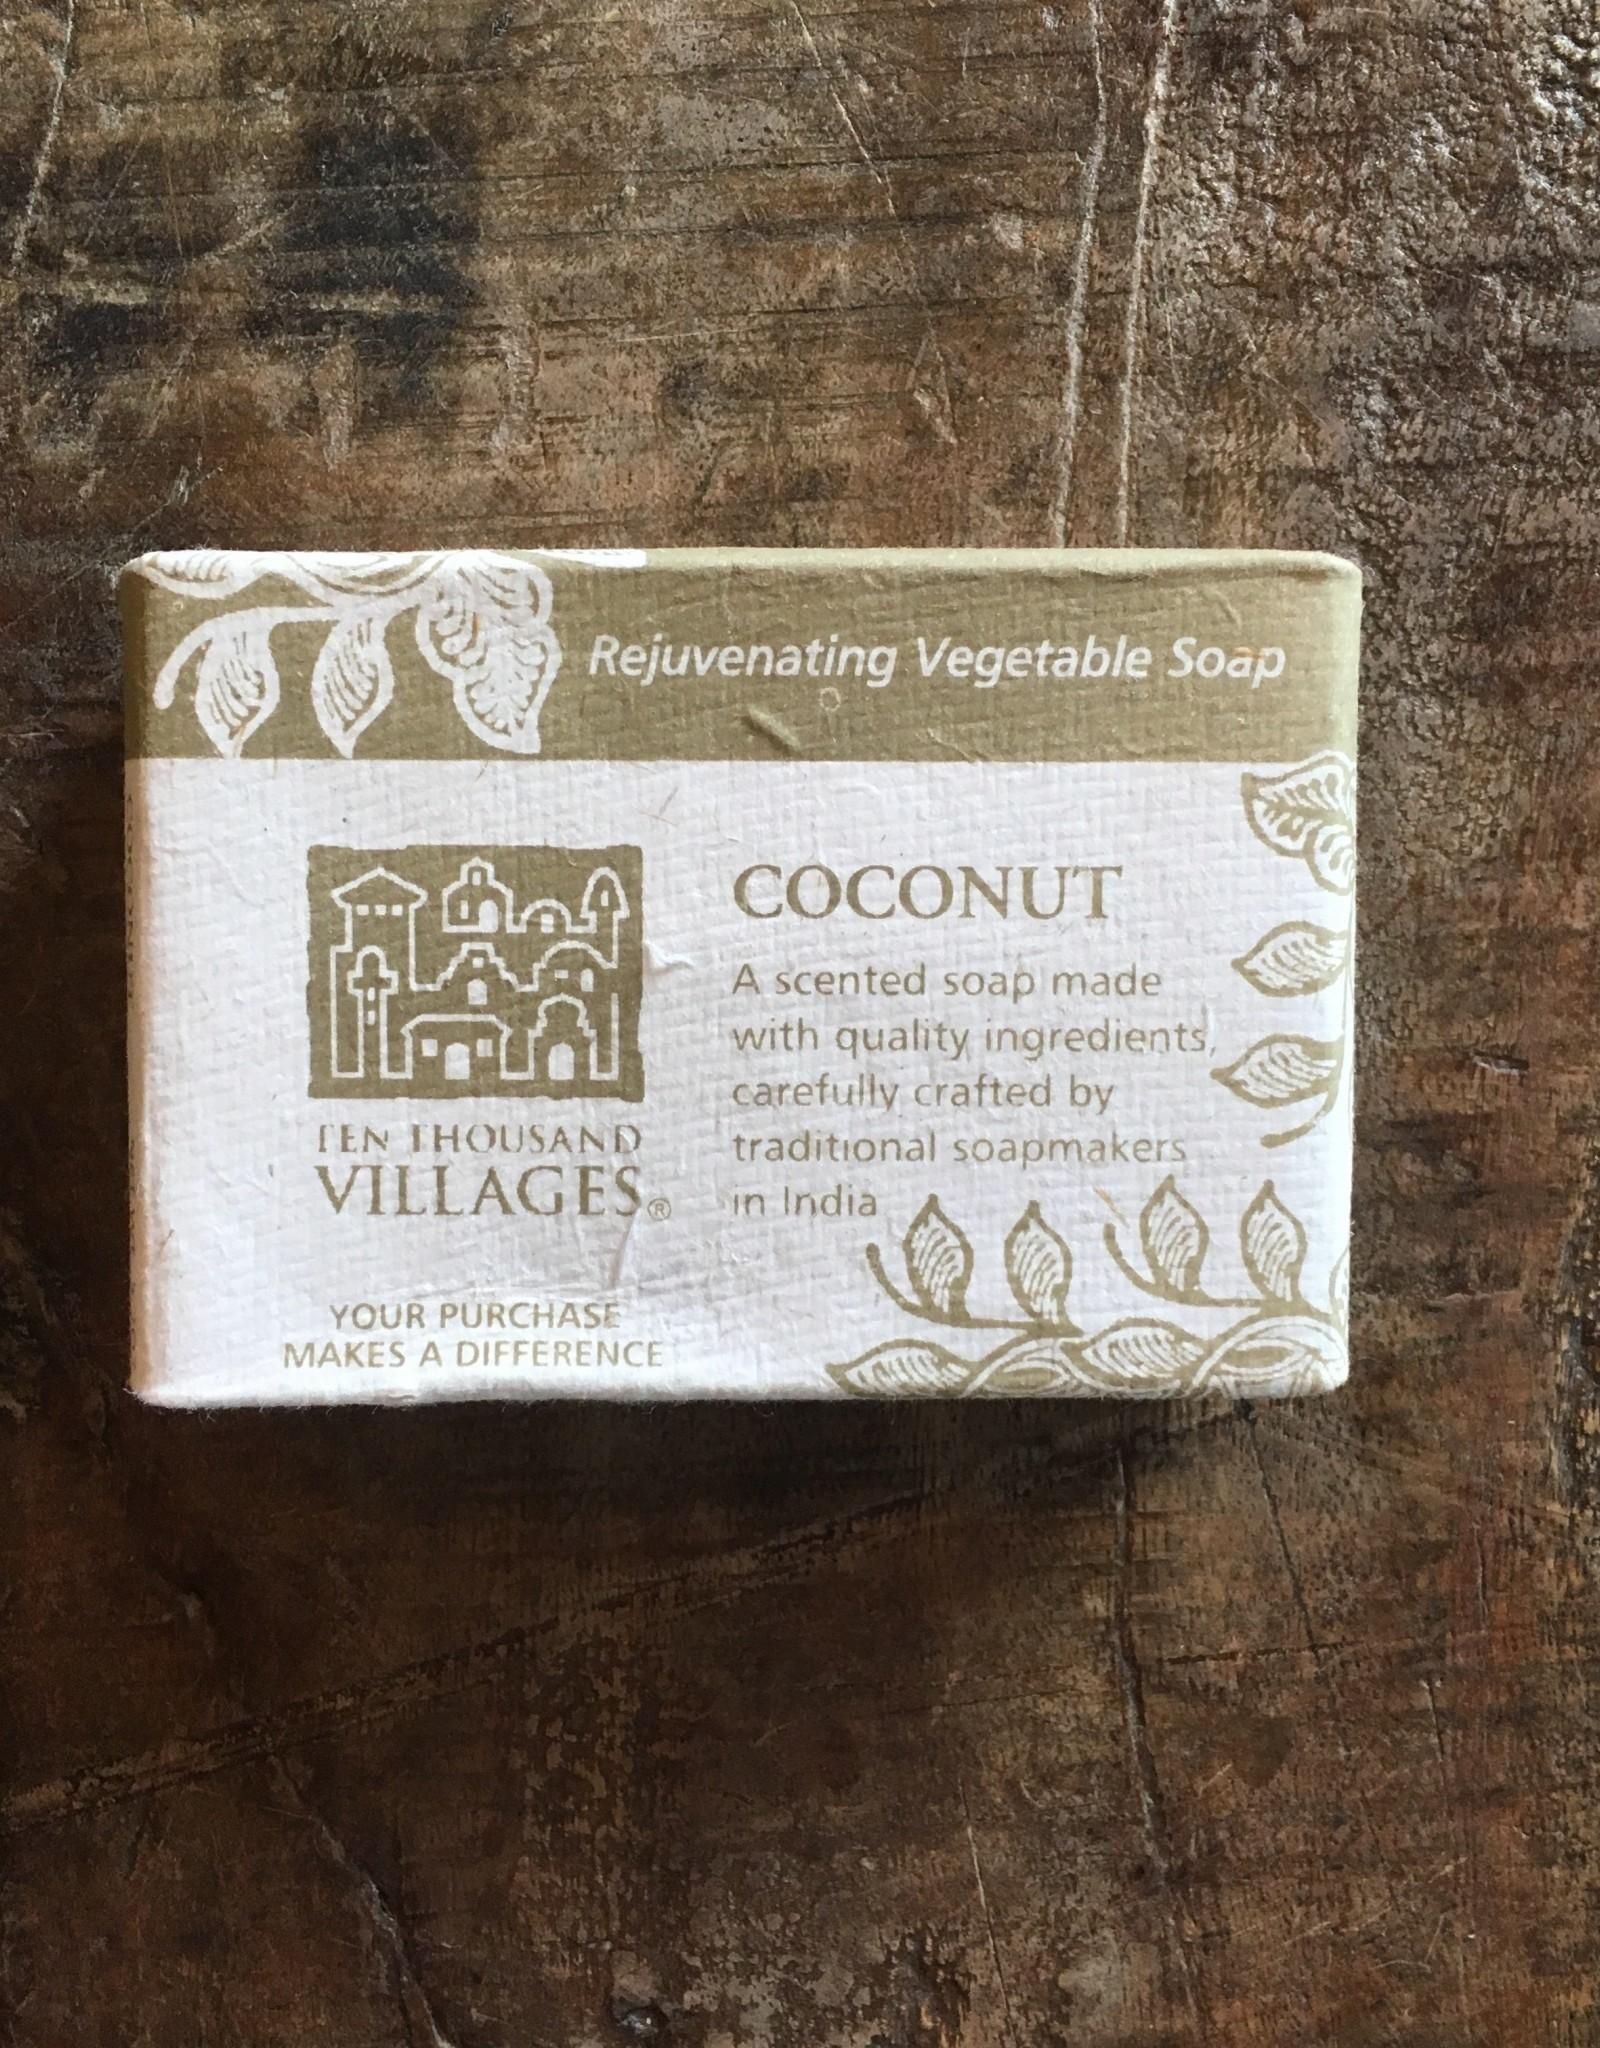 feb17 India, Vegetable Soap Coconut